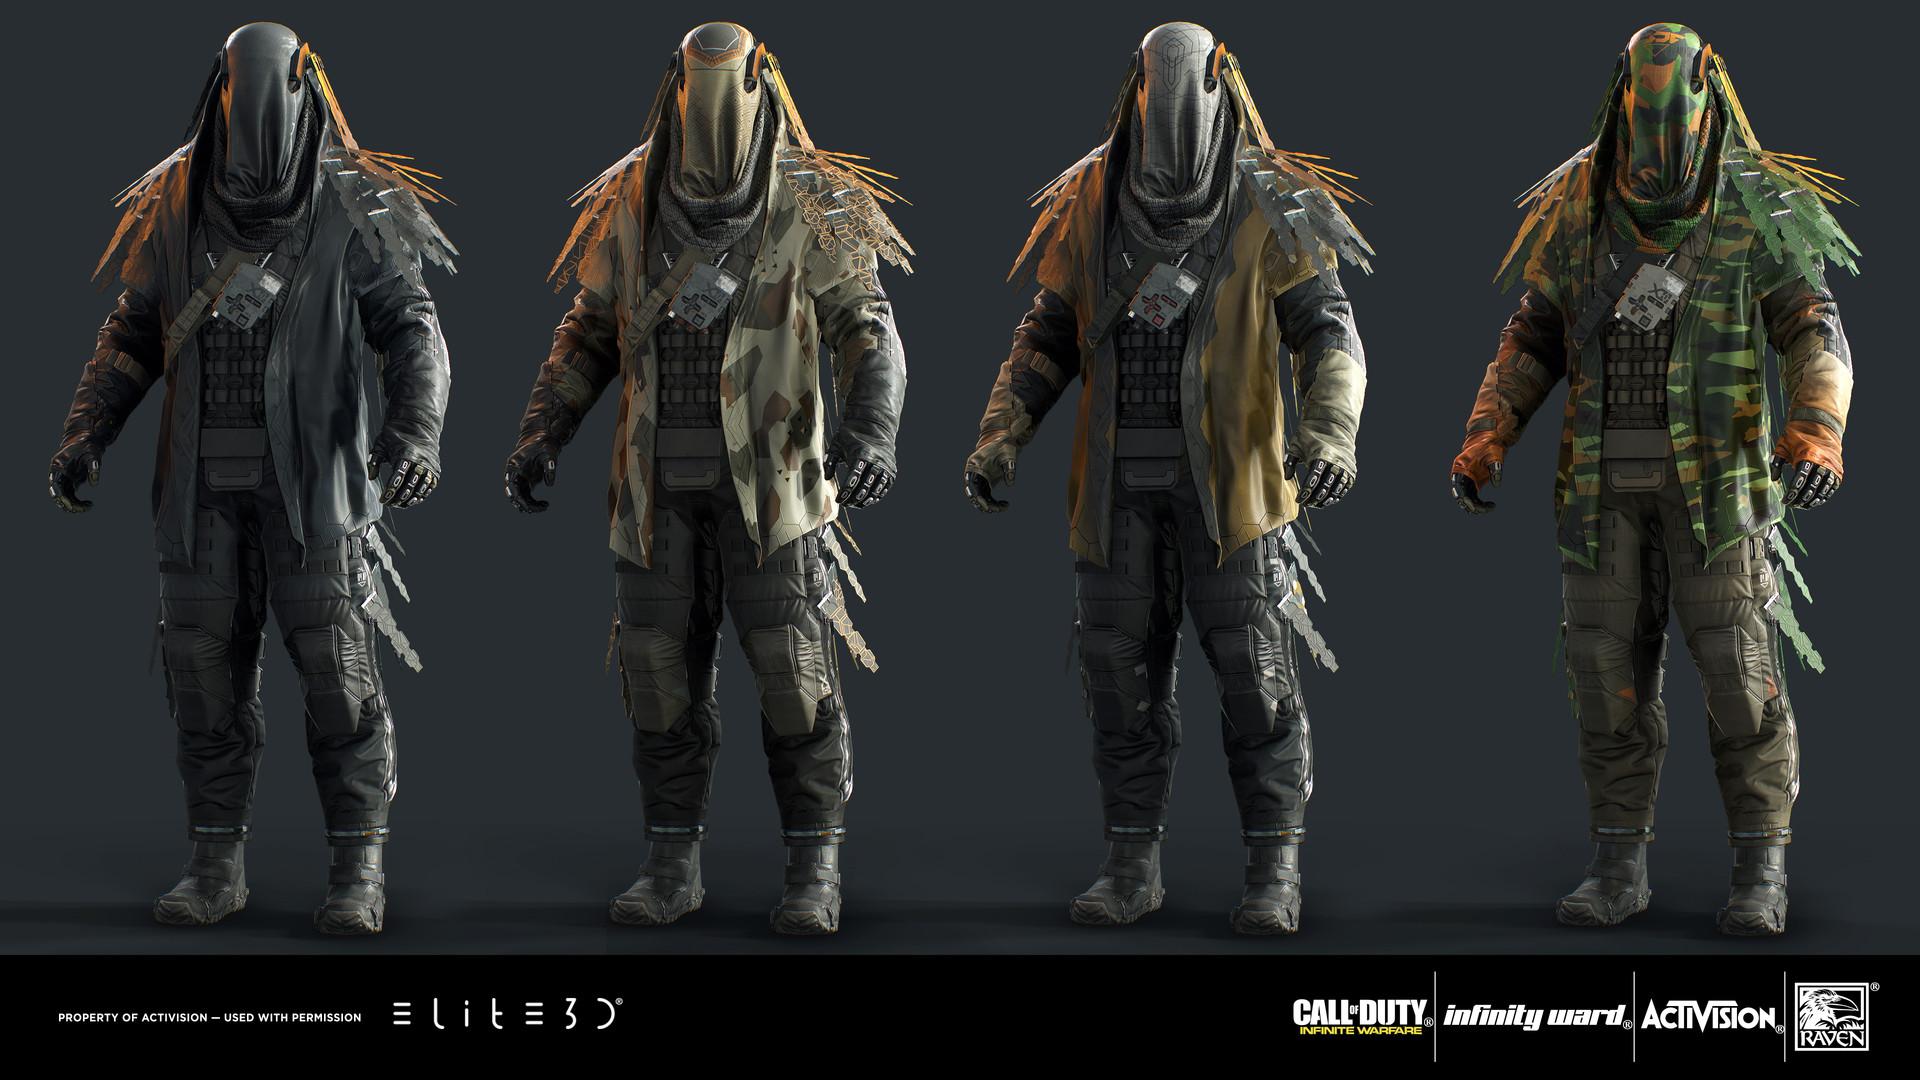 Elite3d Call Of Duty Infinite Warfare Quot Phantom Quot Character